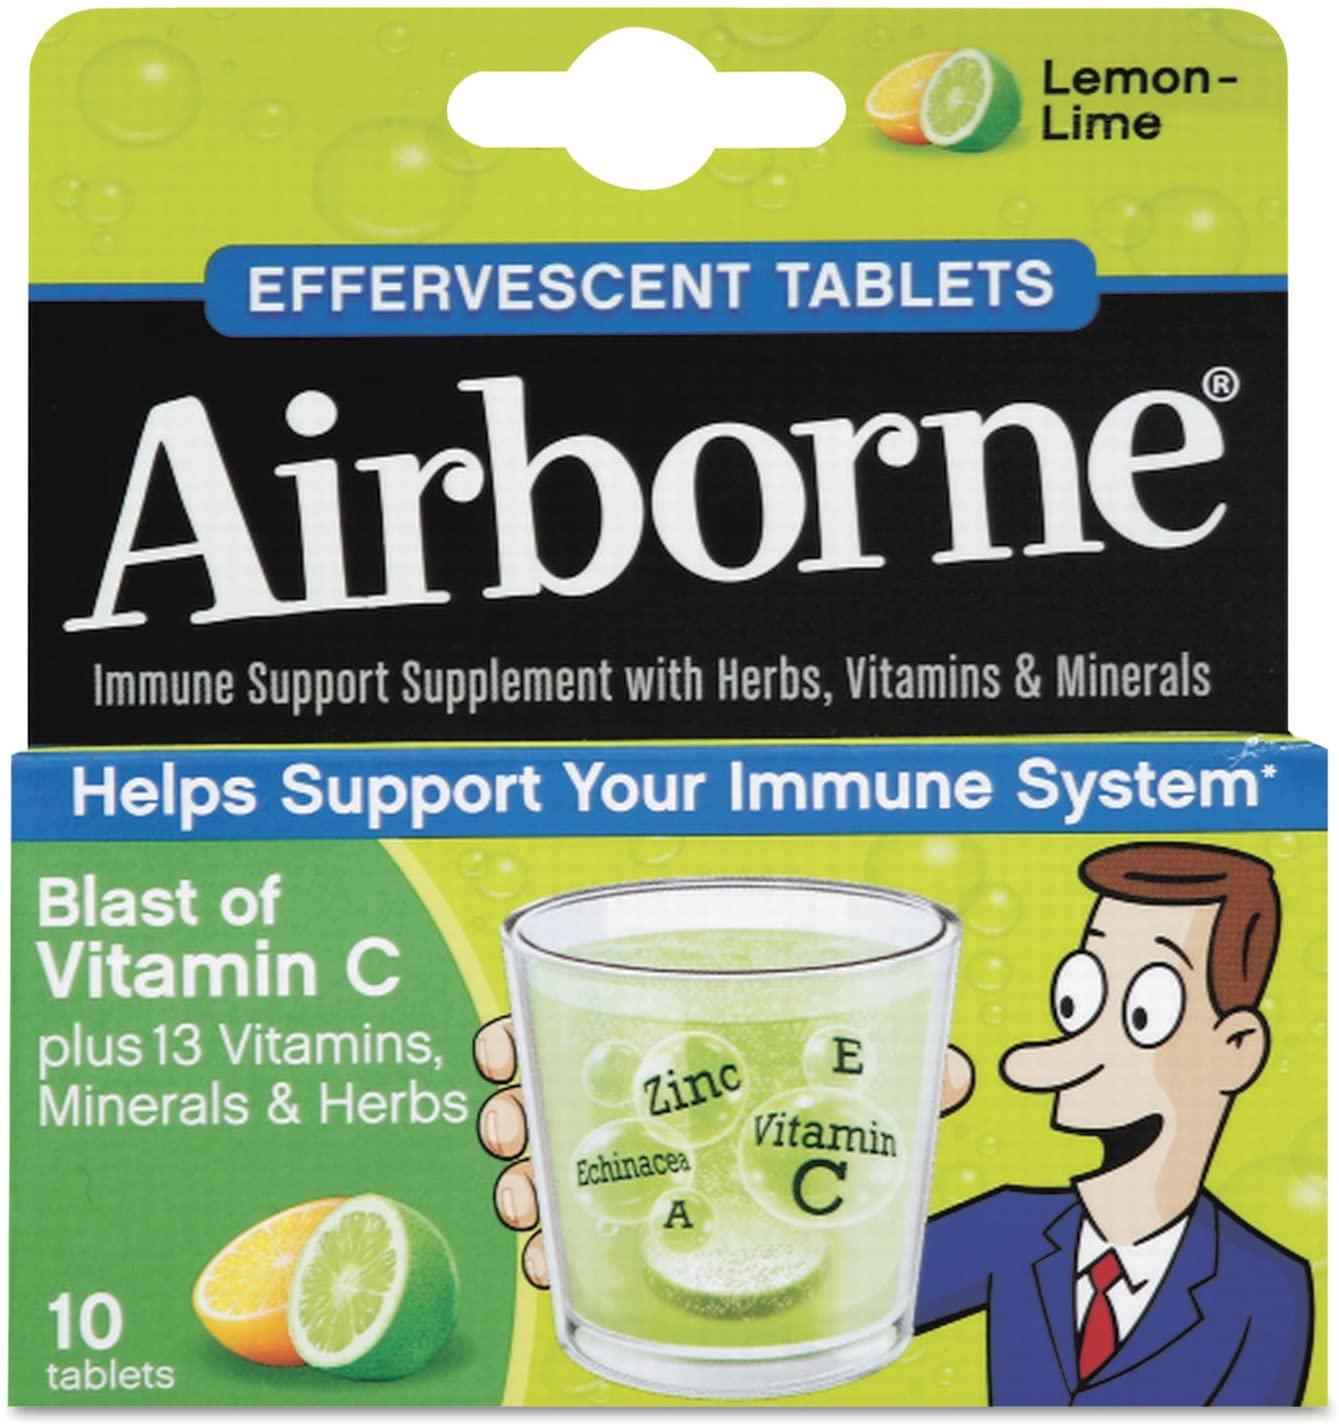 Airborne 30006 Immune Support Effervescent Tablet, Lemon/Lime, 10 Count